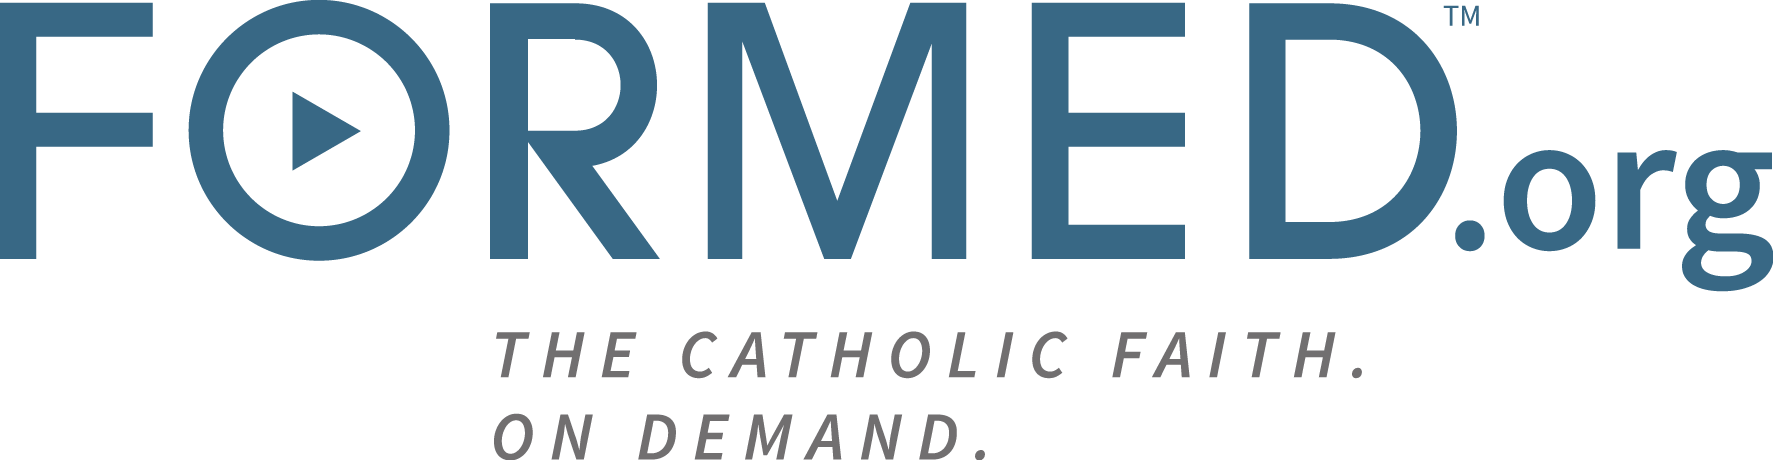 formed.org-logo-withTag-1.png